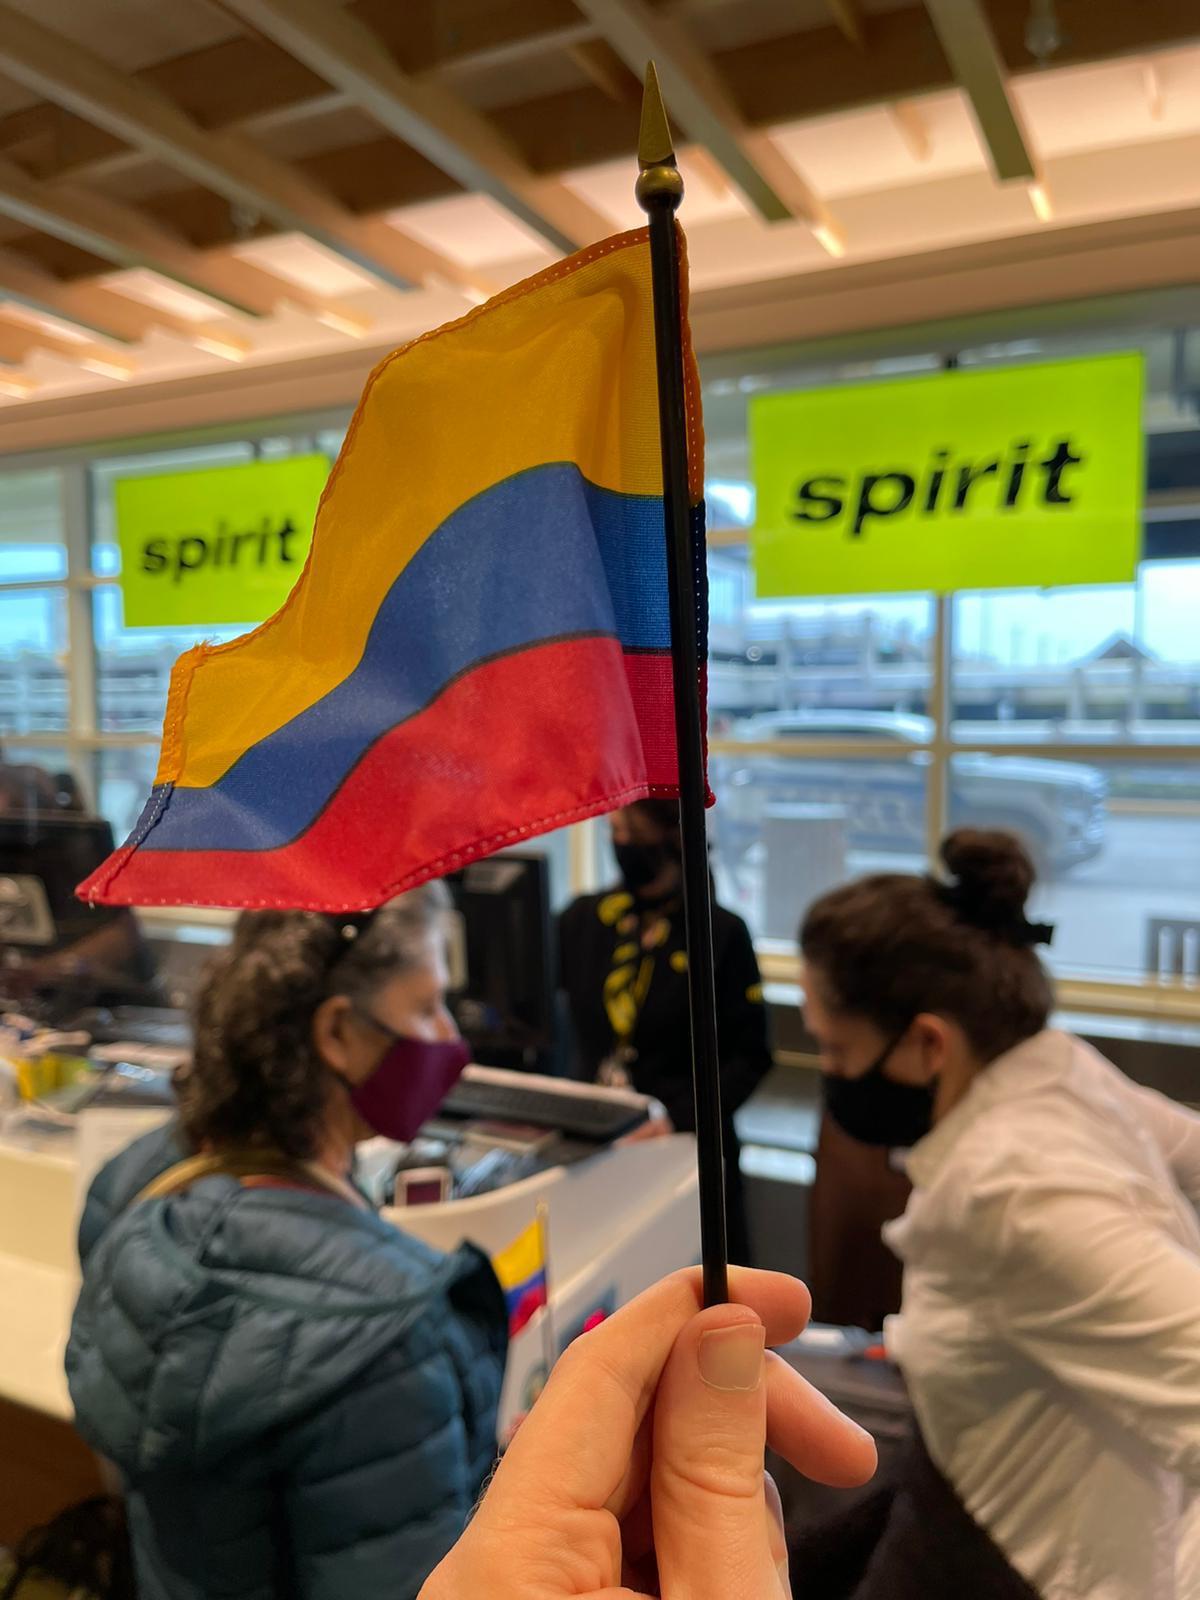 Apertura de vuelo directo de SpiritAirlines de Orlando a Bogotá